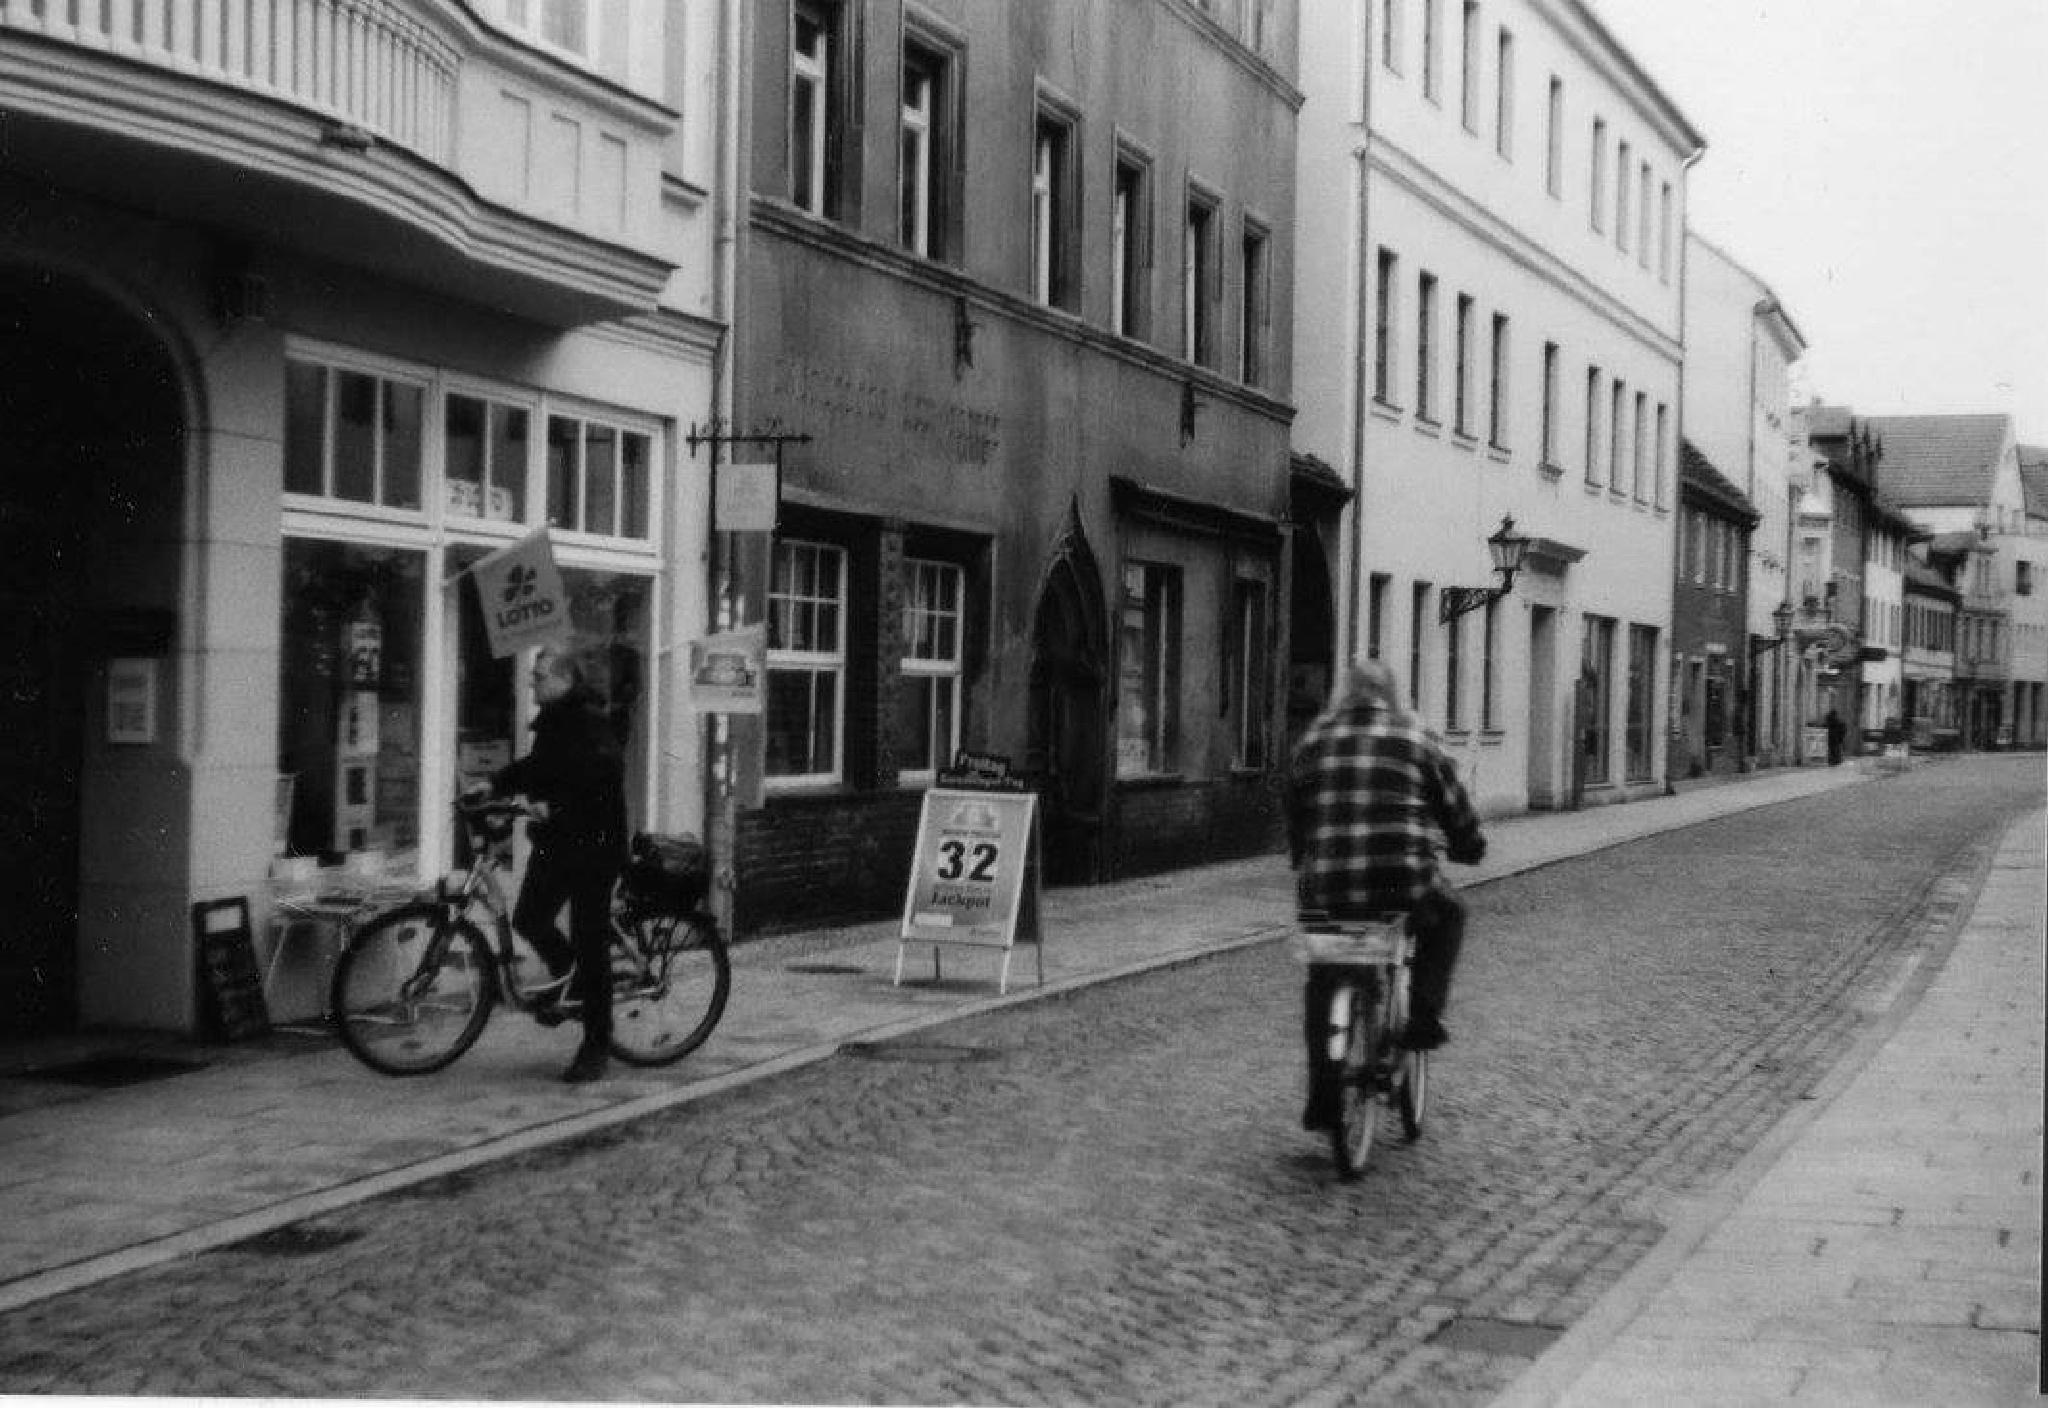 Wittenberg - Town's Life by filiplipinski1